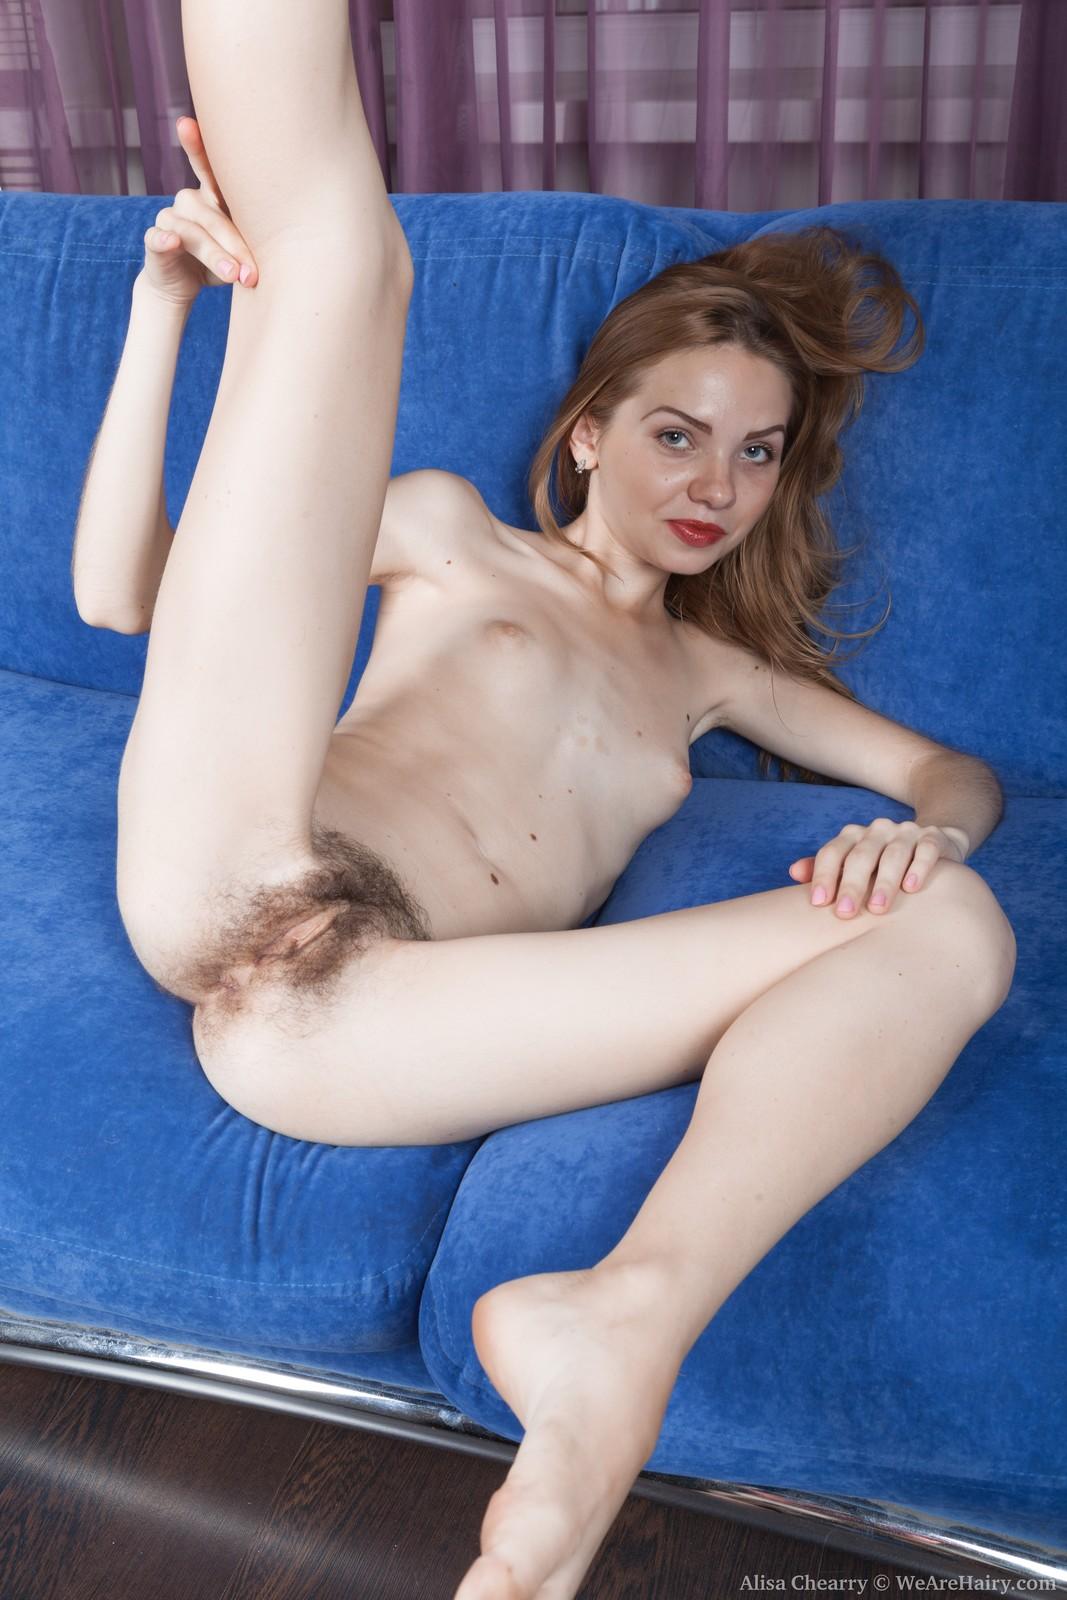 Naked asian leaked photos